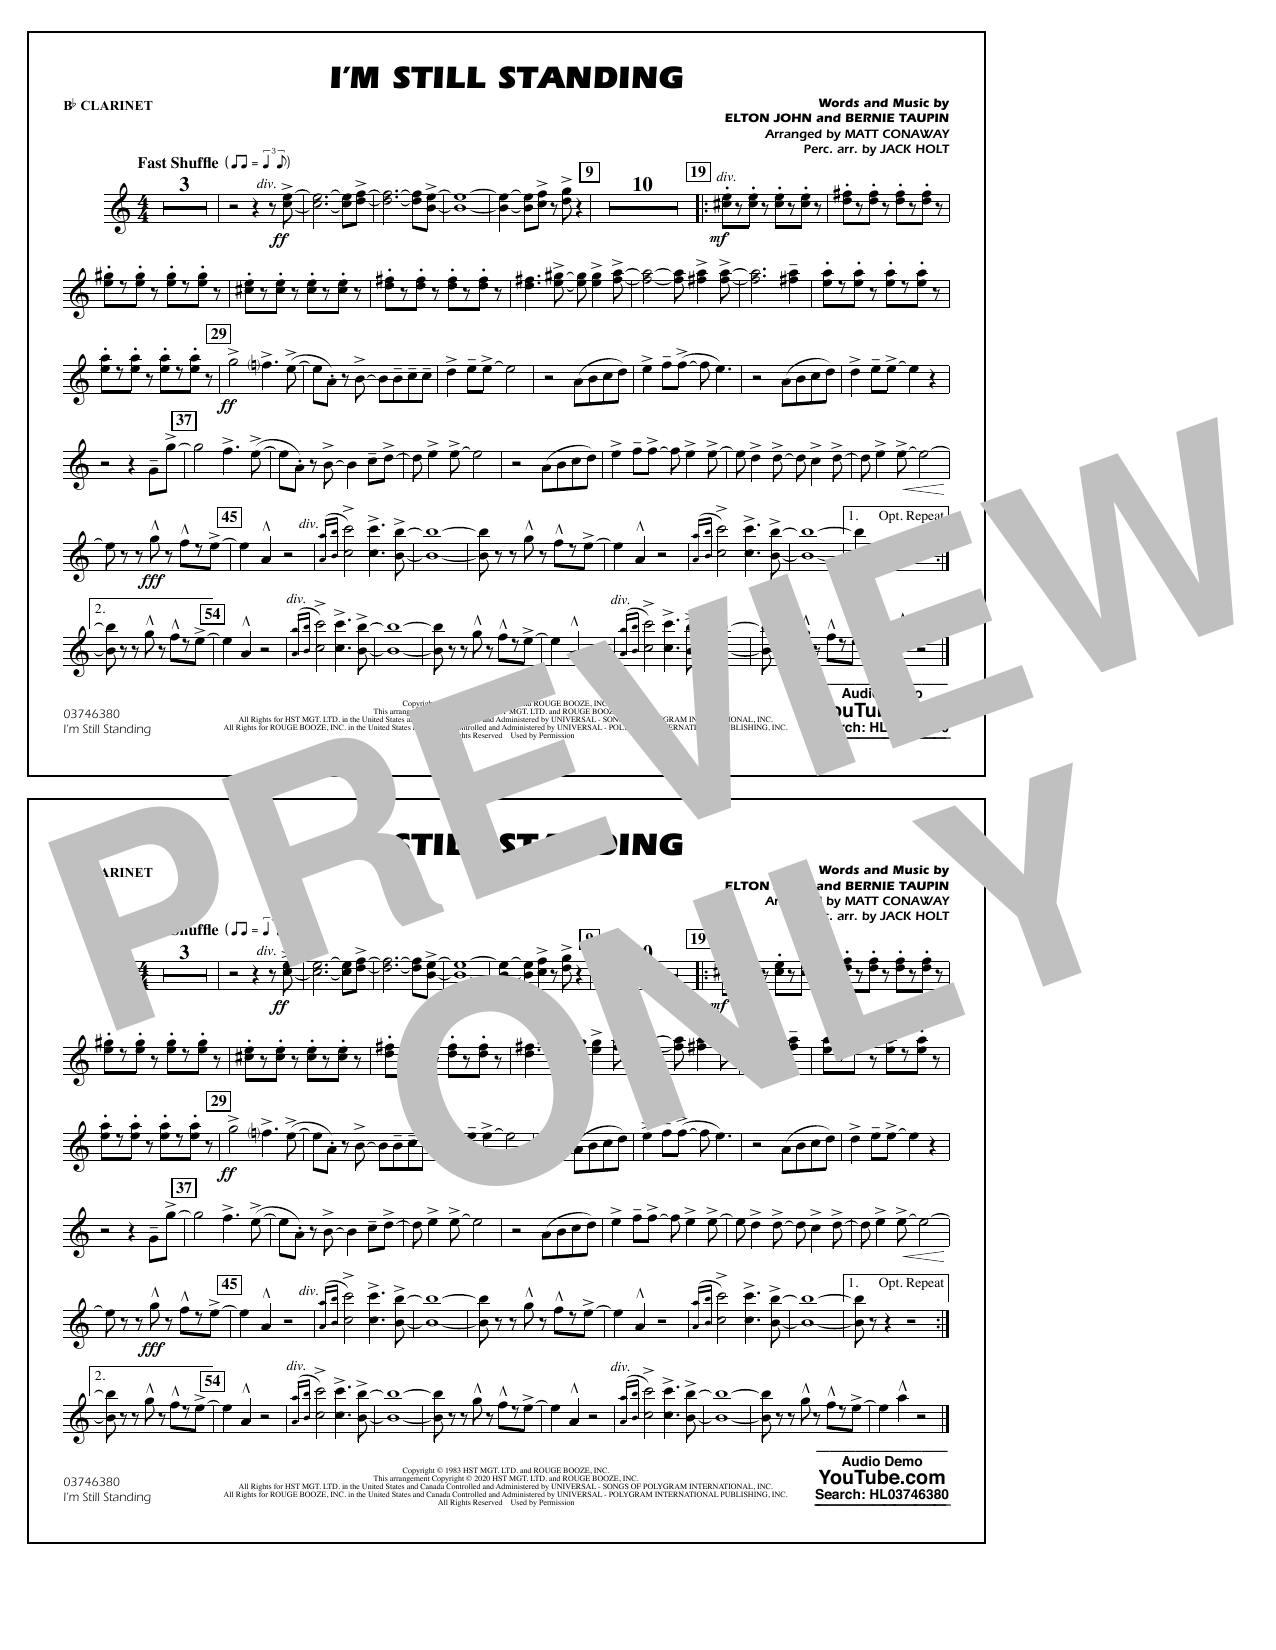 I'm Still Standing (arr. Matt Conaway and Jack Holt) - Bb Clarinet Sheet Music